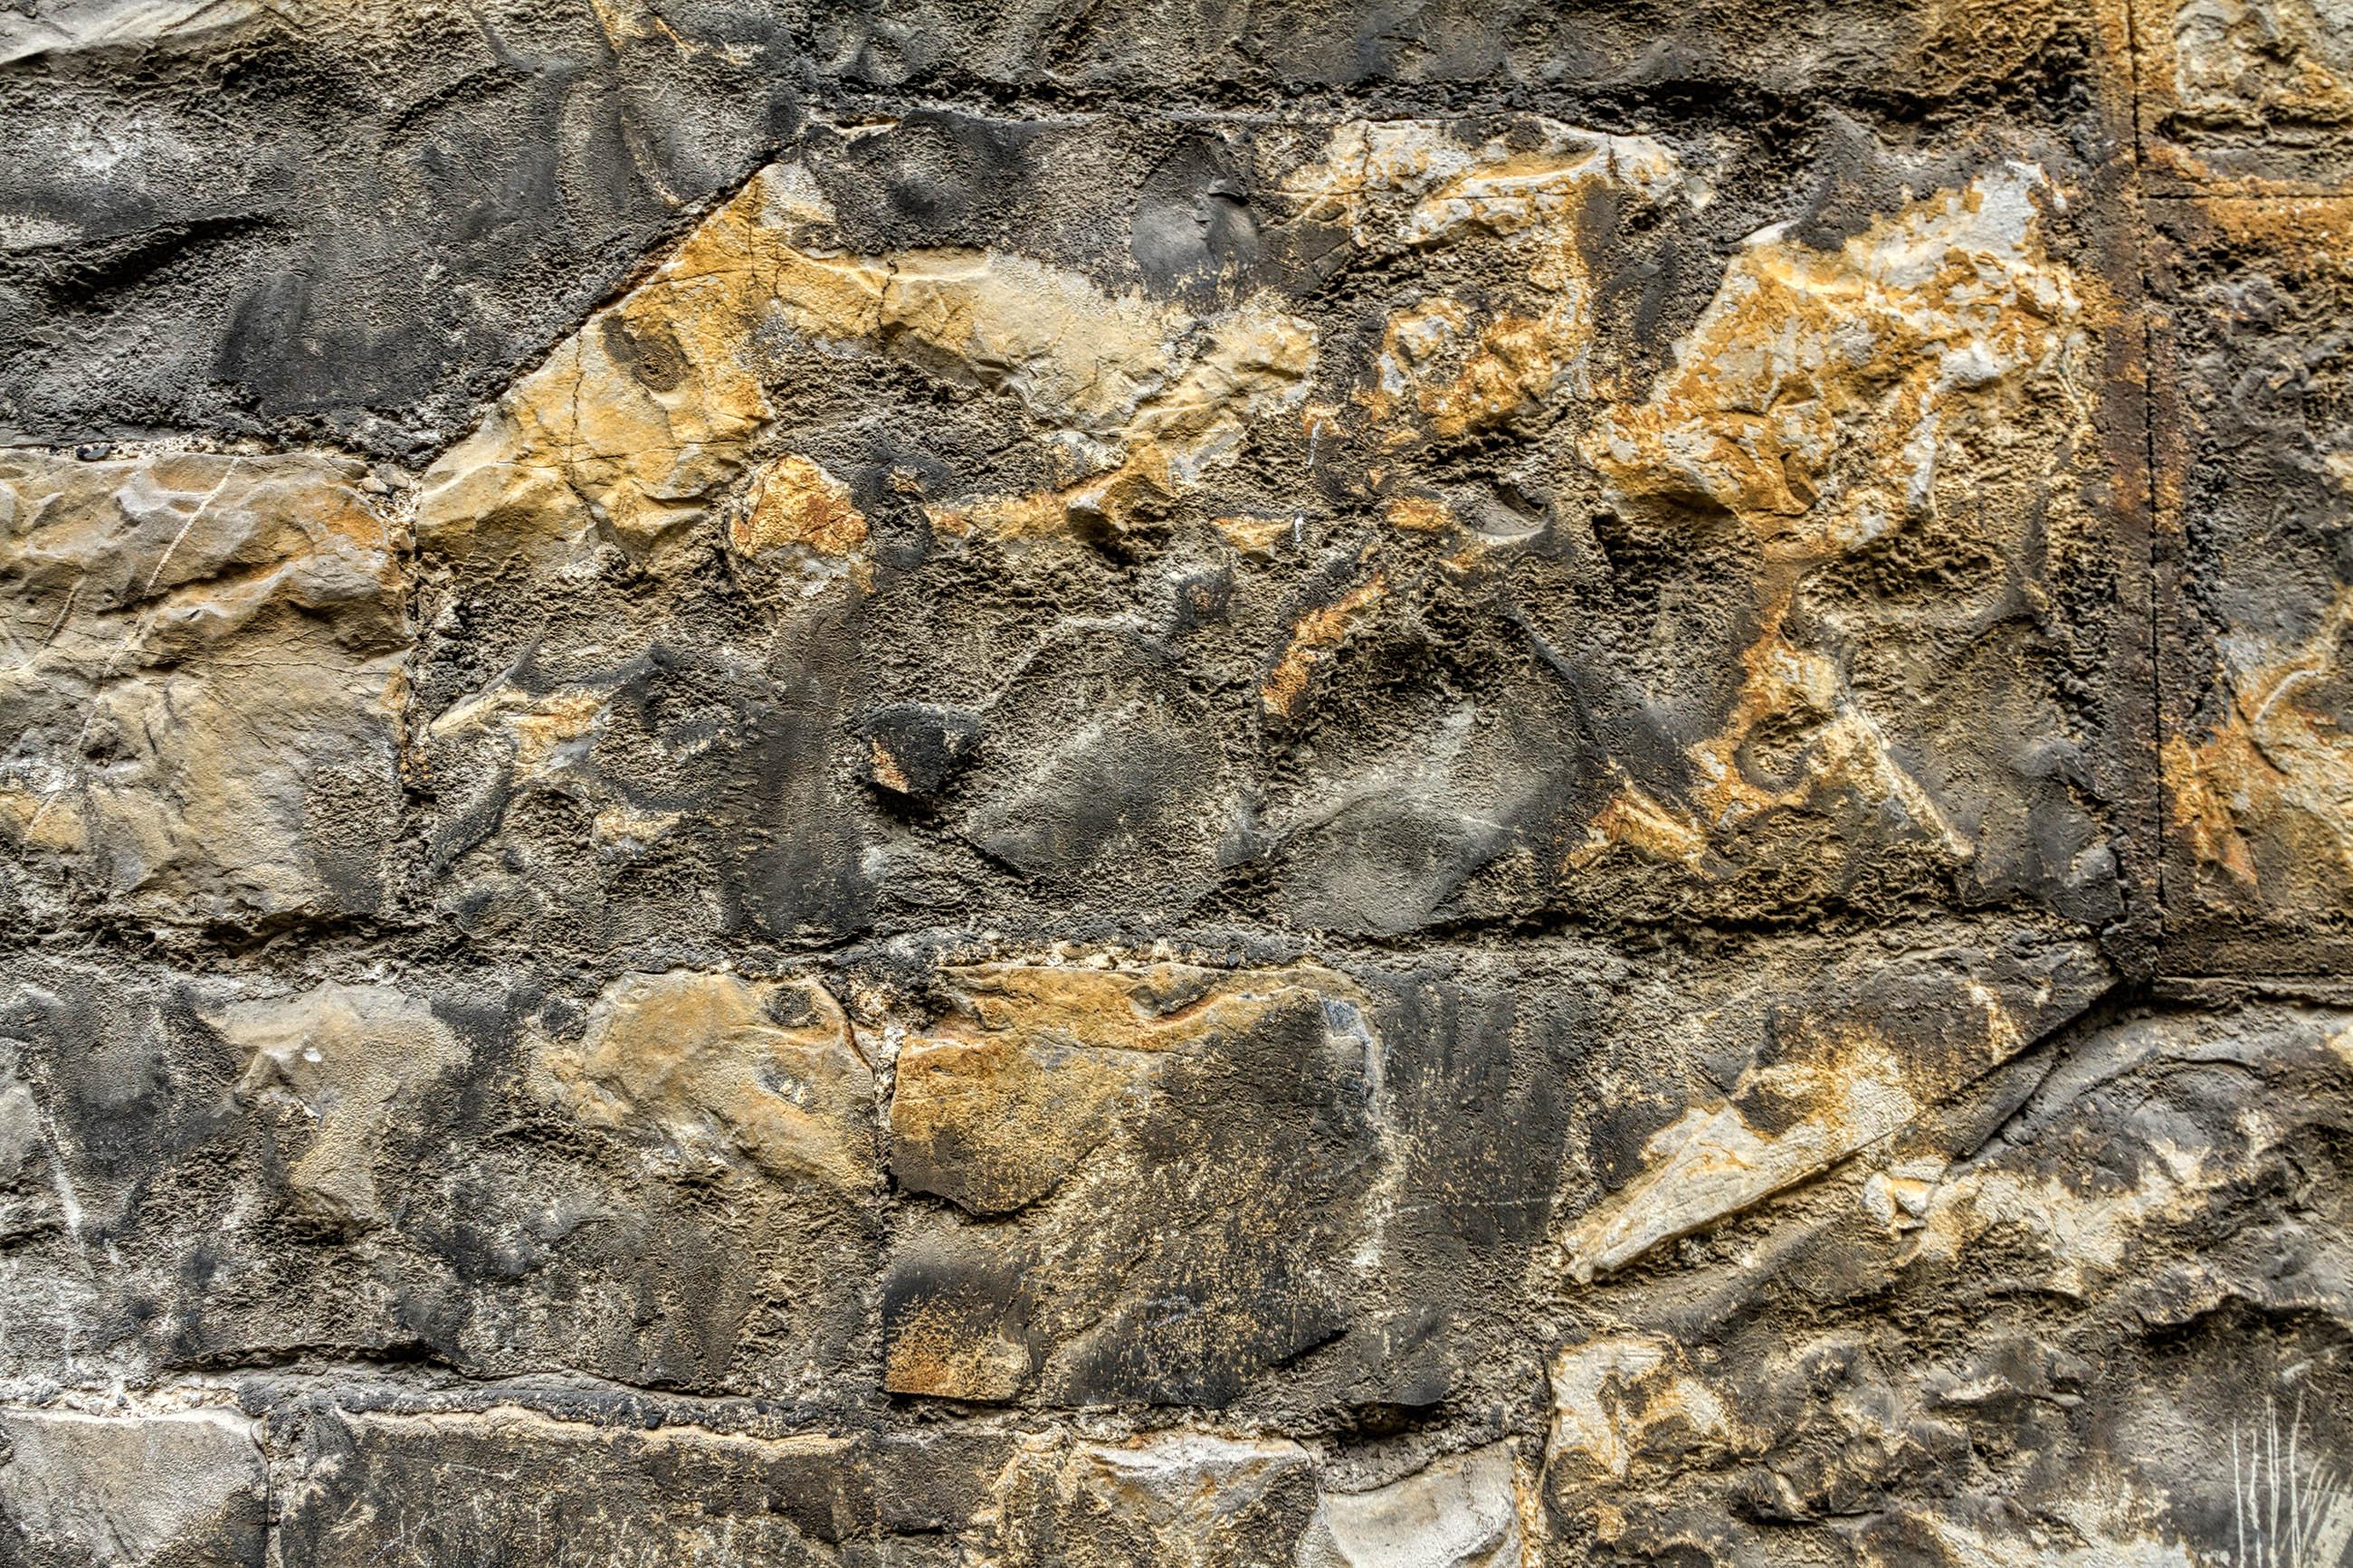 Stone texture photo